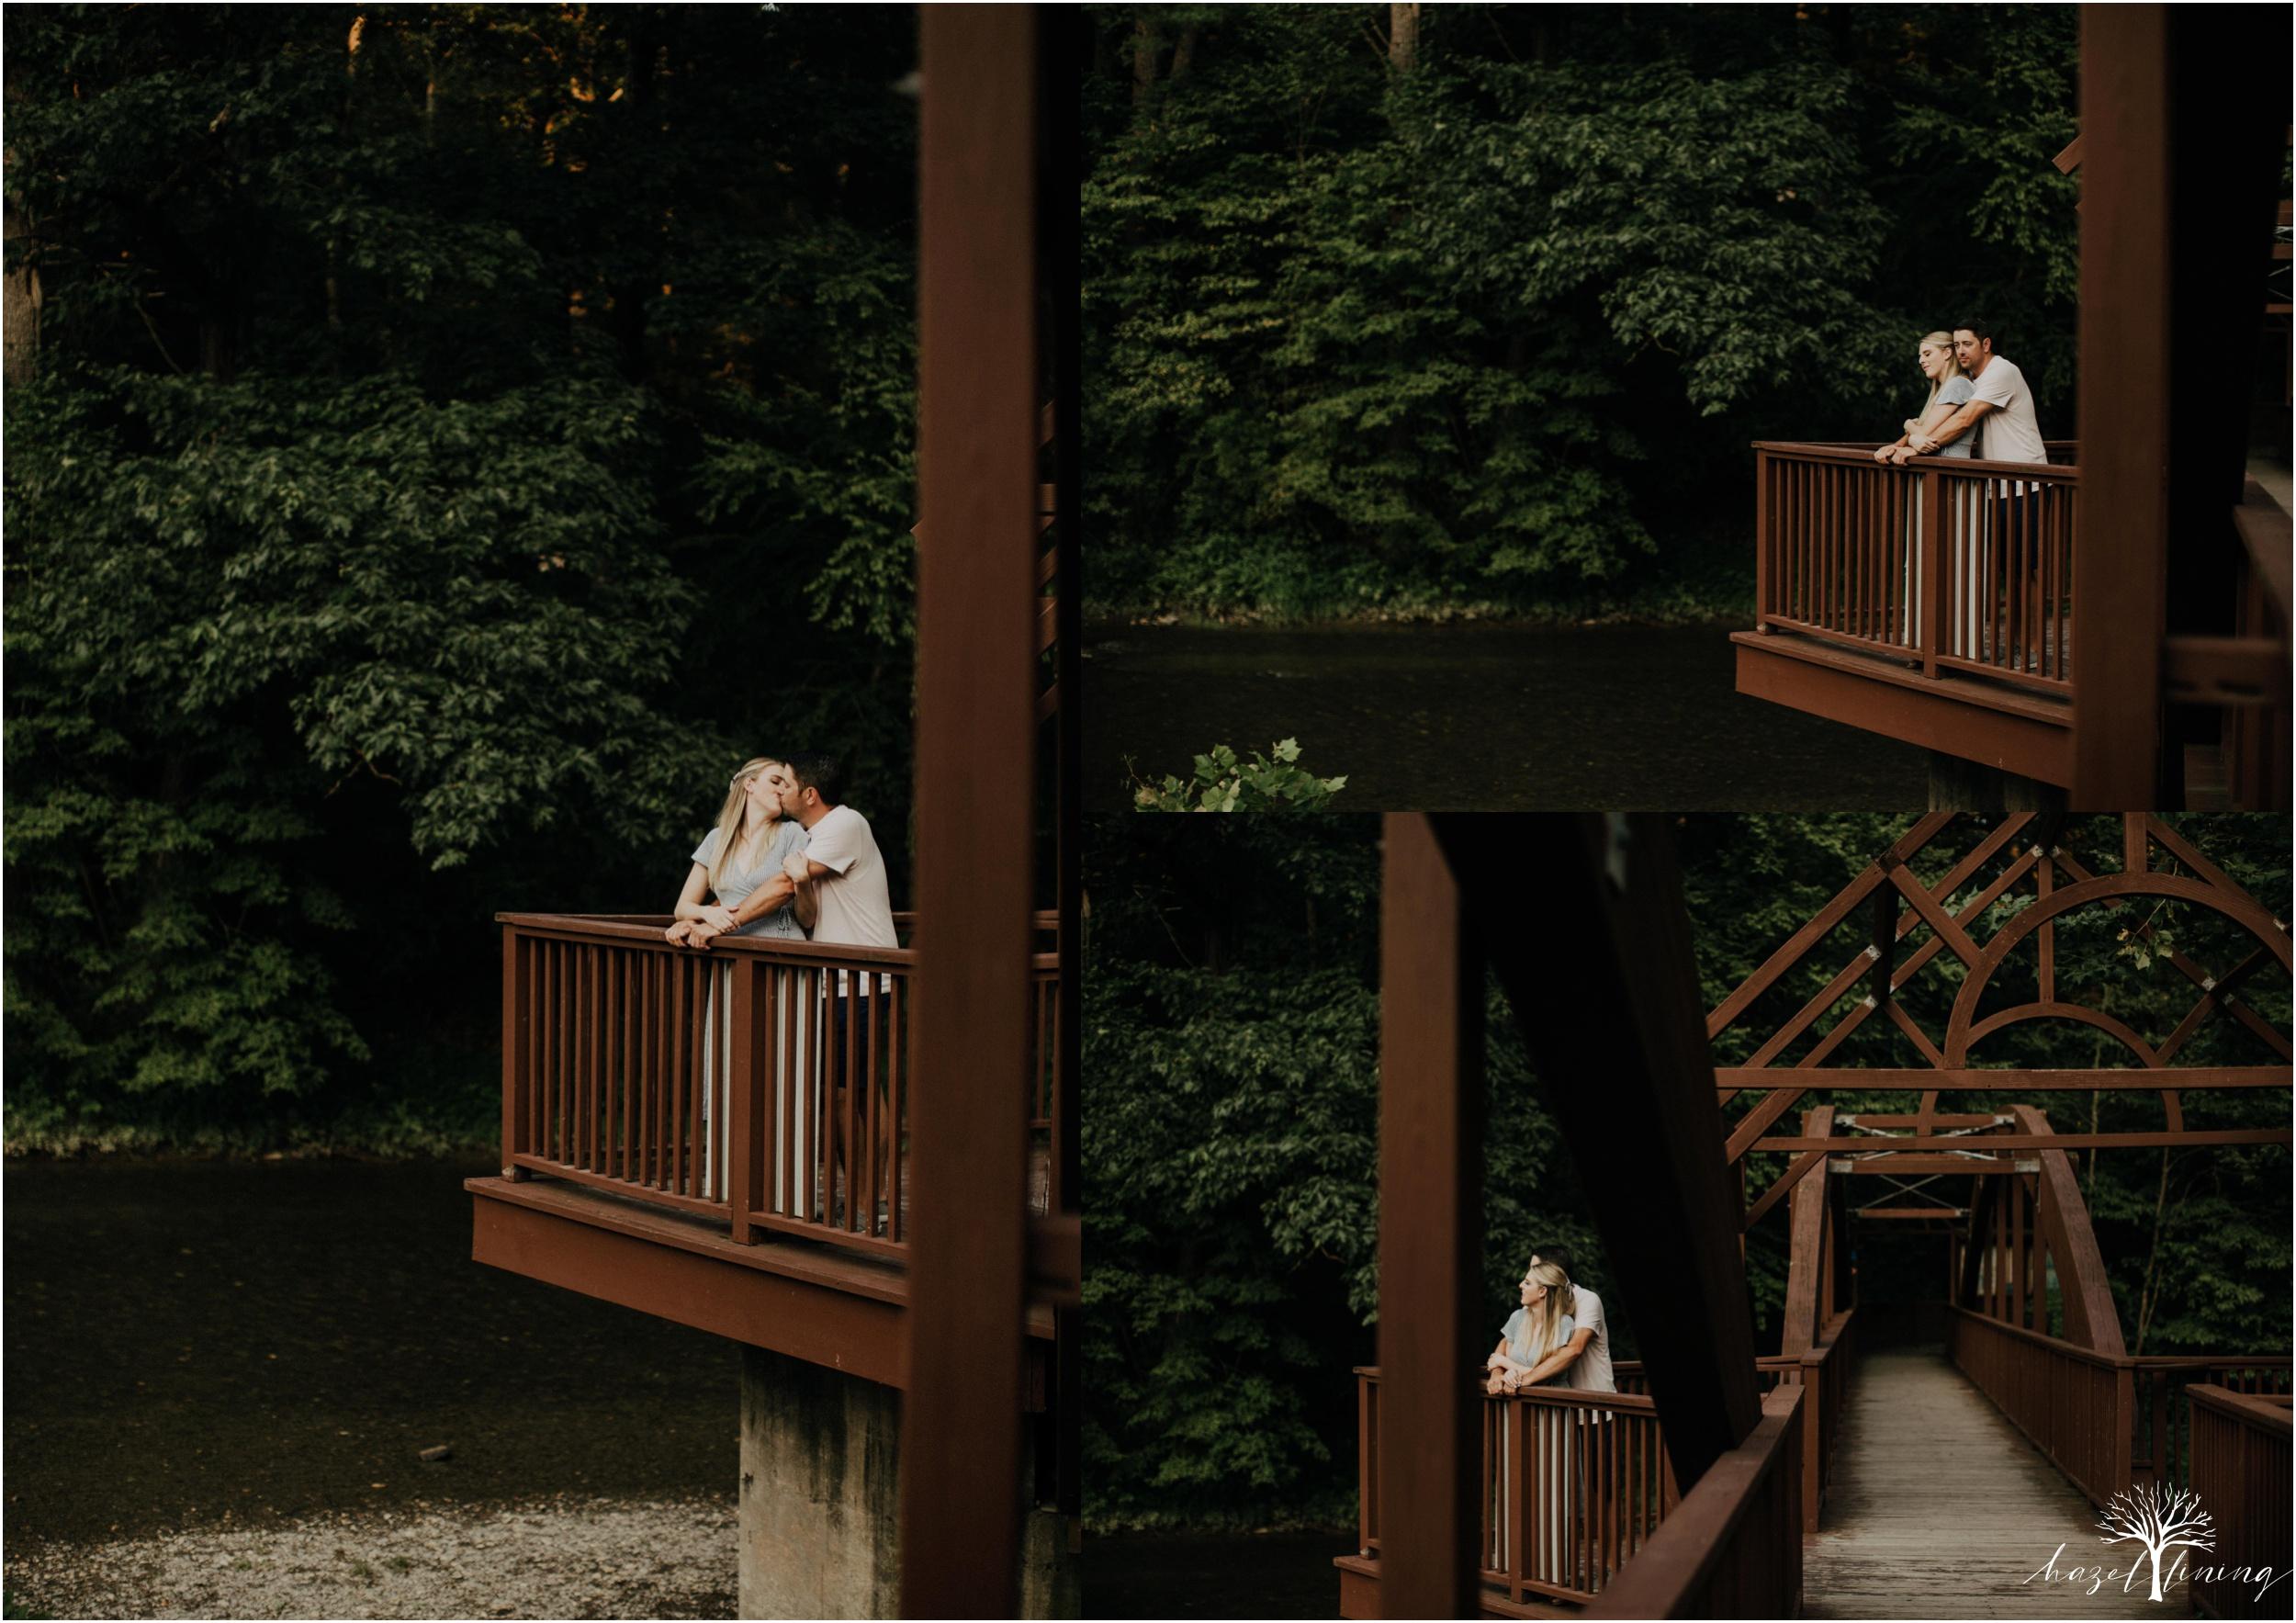 ashley-fillmore-steve-reimer-trexler-nature-preserve-summer-engagement-session-schnecksville-pennsylvania-hazel-lining-photography-destination-elopement-wedding-engagement-photography_0017.jpg